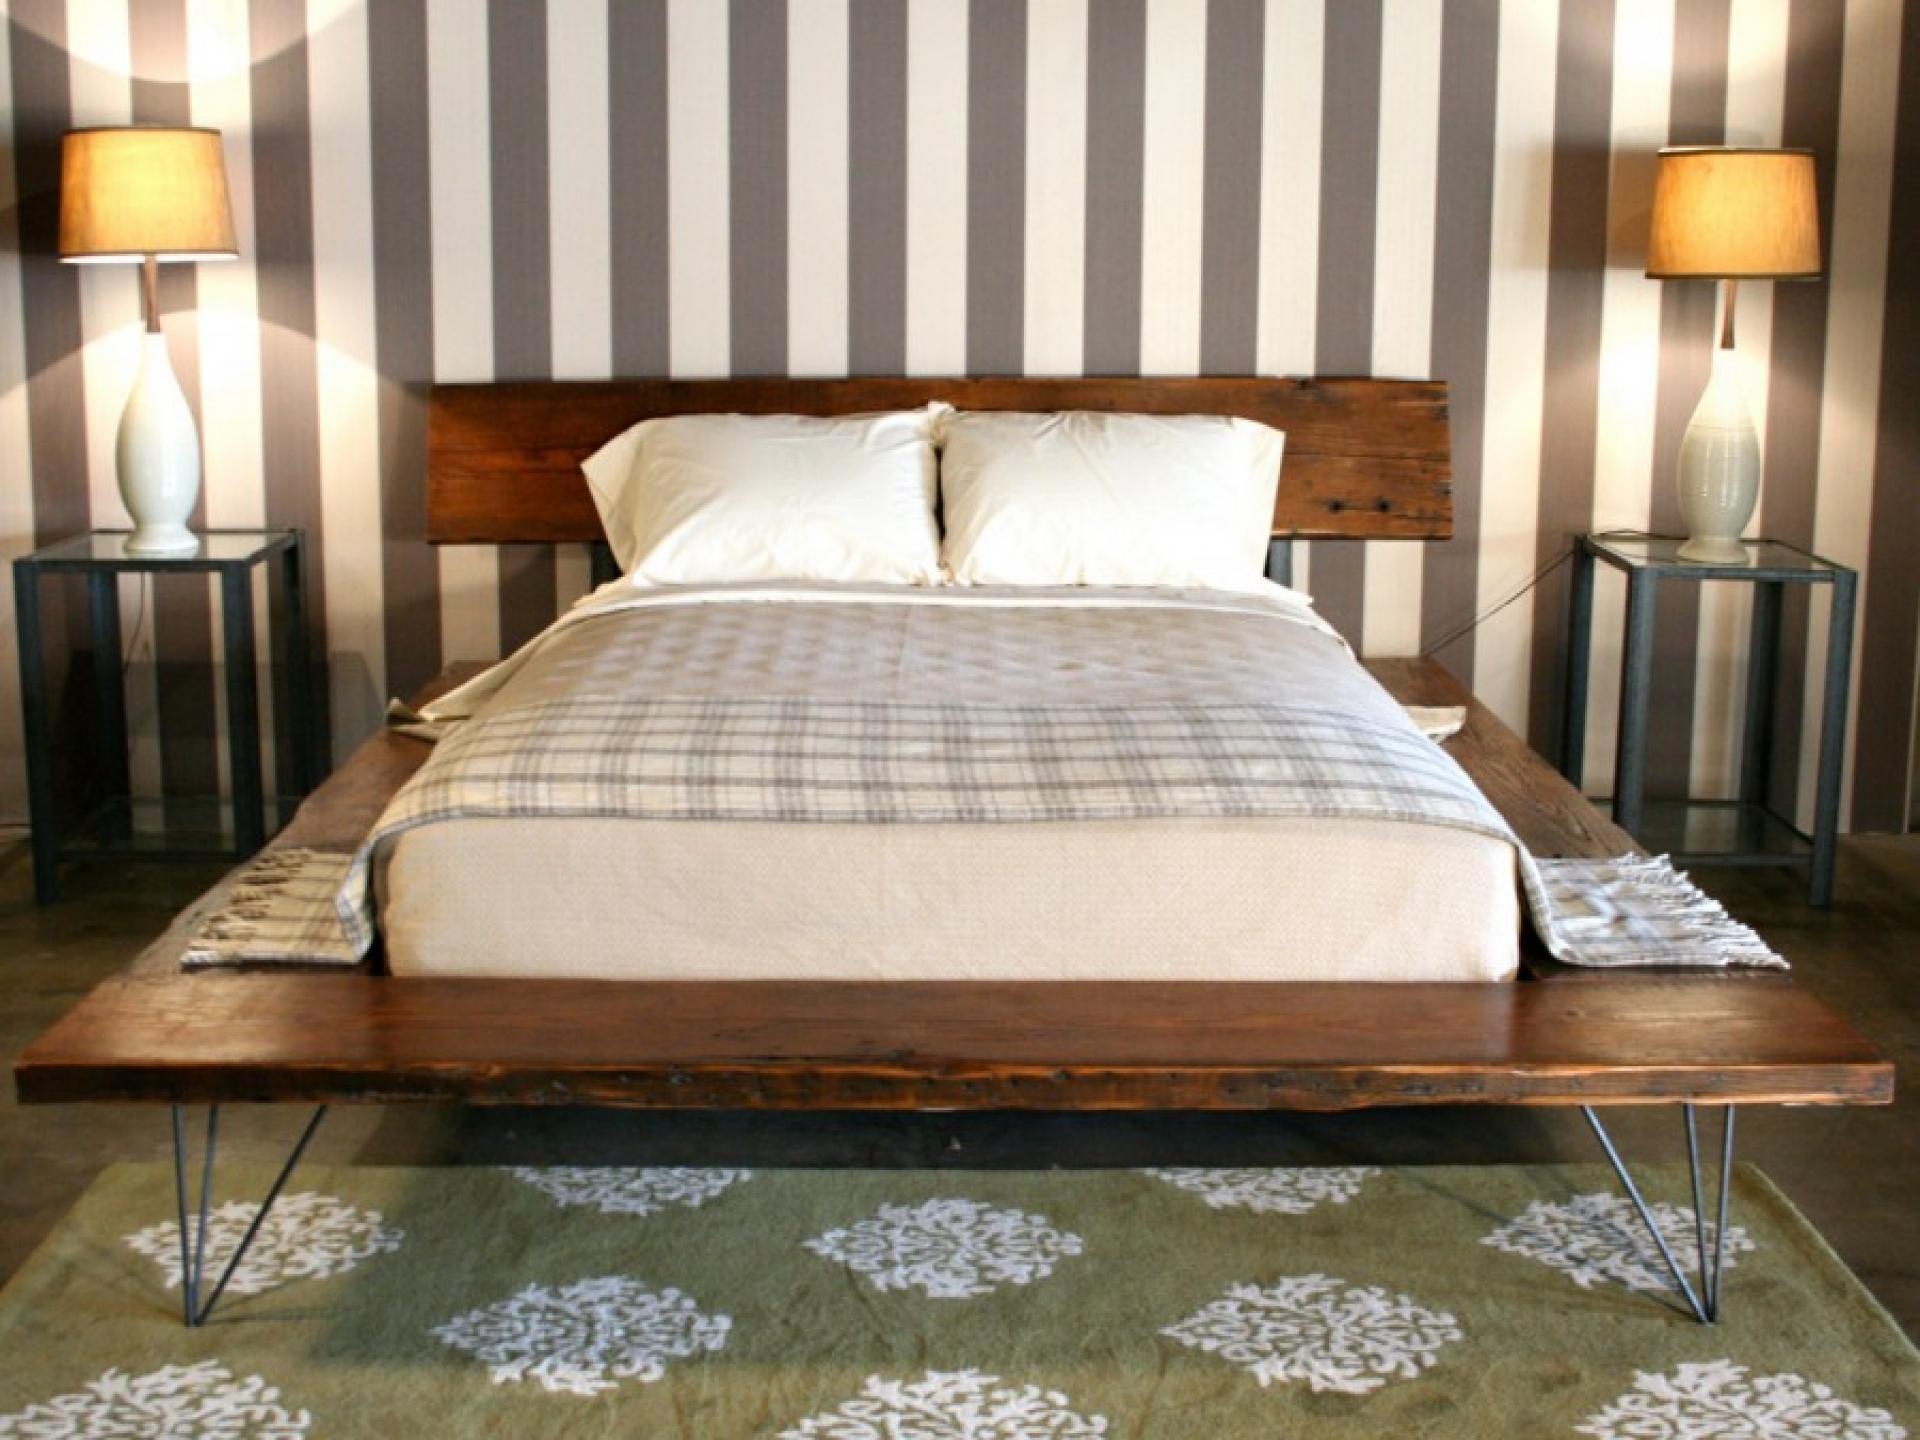 Full Size of Tatami Bett Plattform Mit Integrierten Nachttischen Design Schubladen 180x200 Betten Stauraum 160x200 Breckle Ausziehbar Clinique Even Better Lattenrost Und Bett Tatami Bett